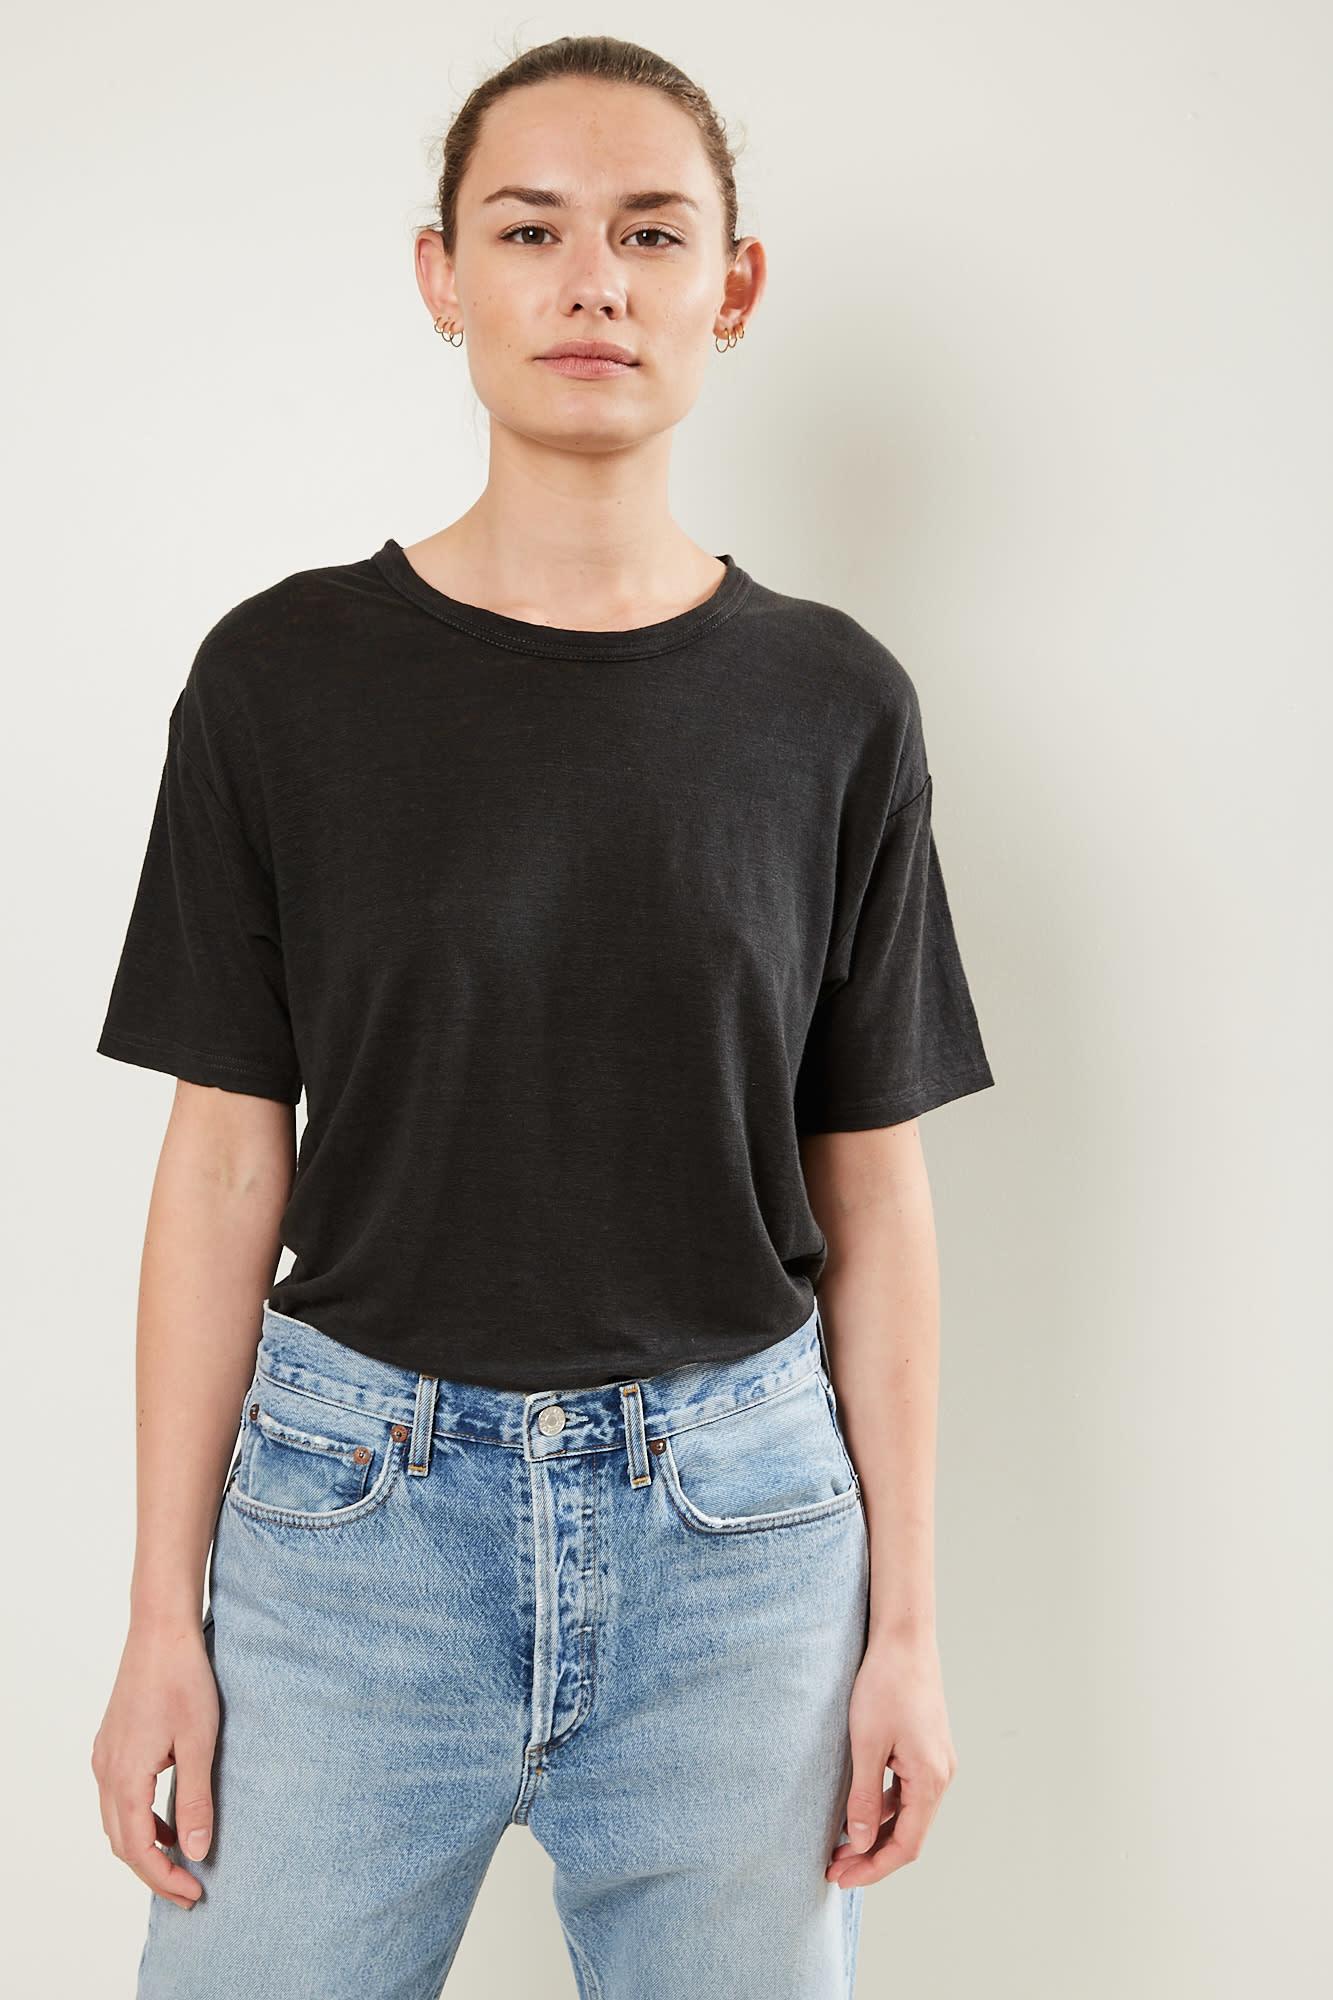 Etoile Isabel Marant keiran tee shirt